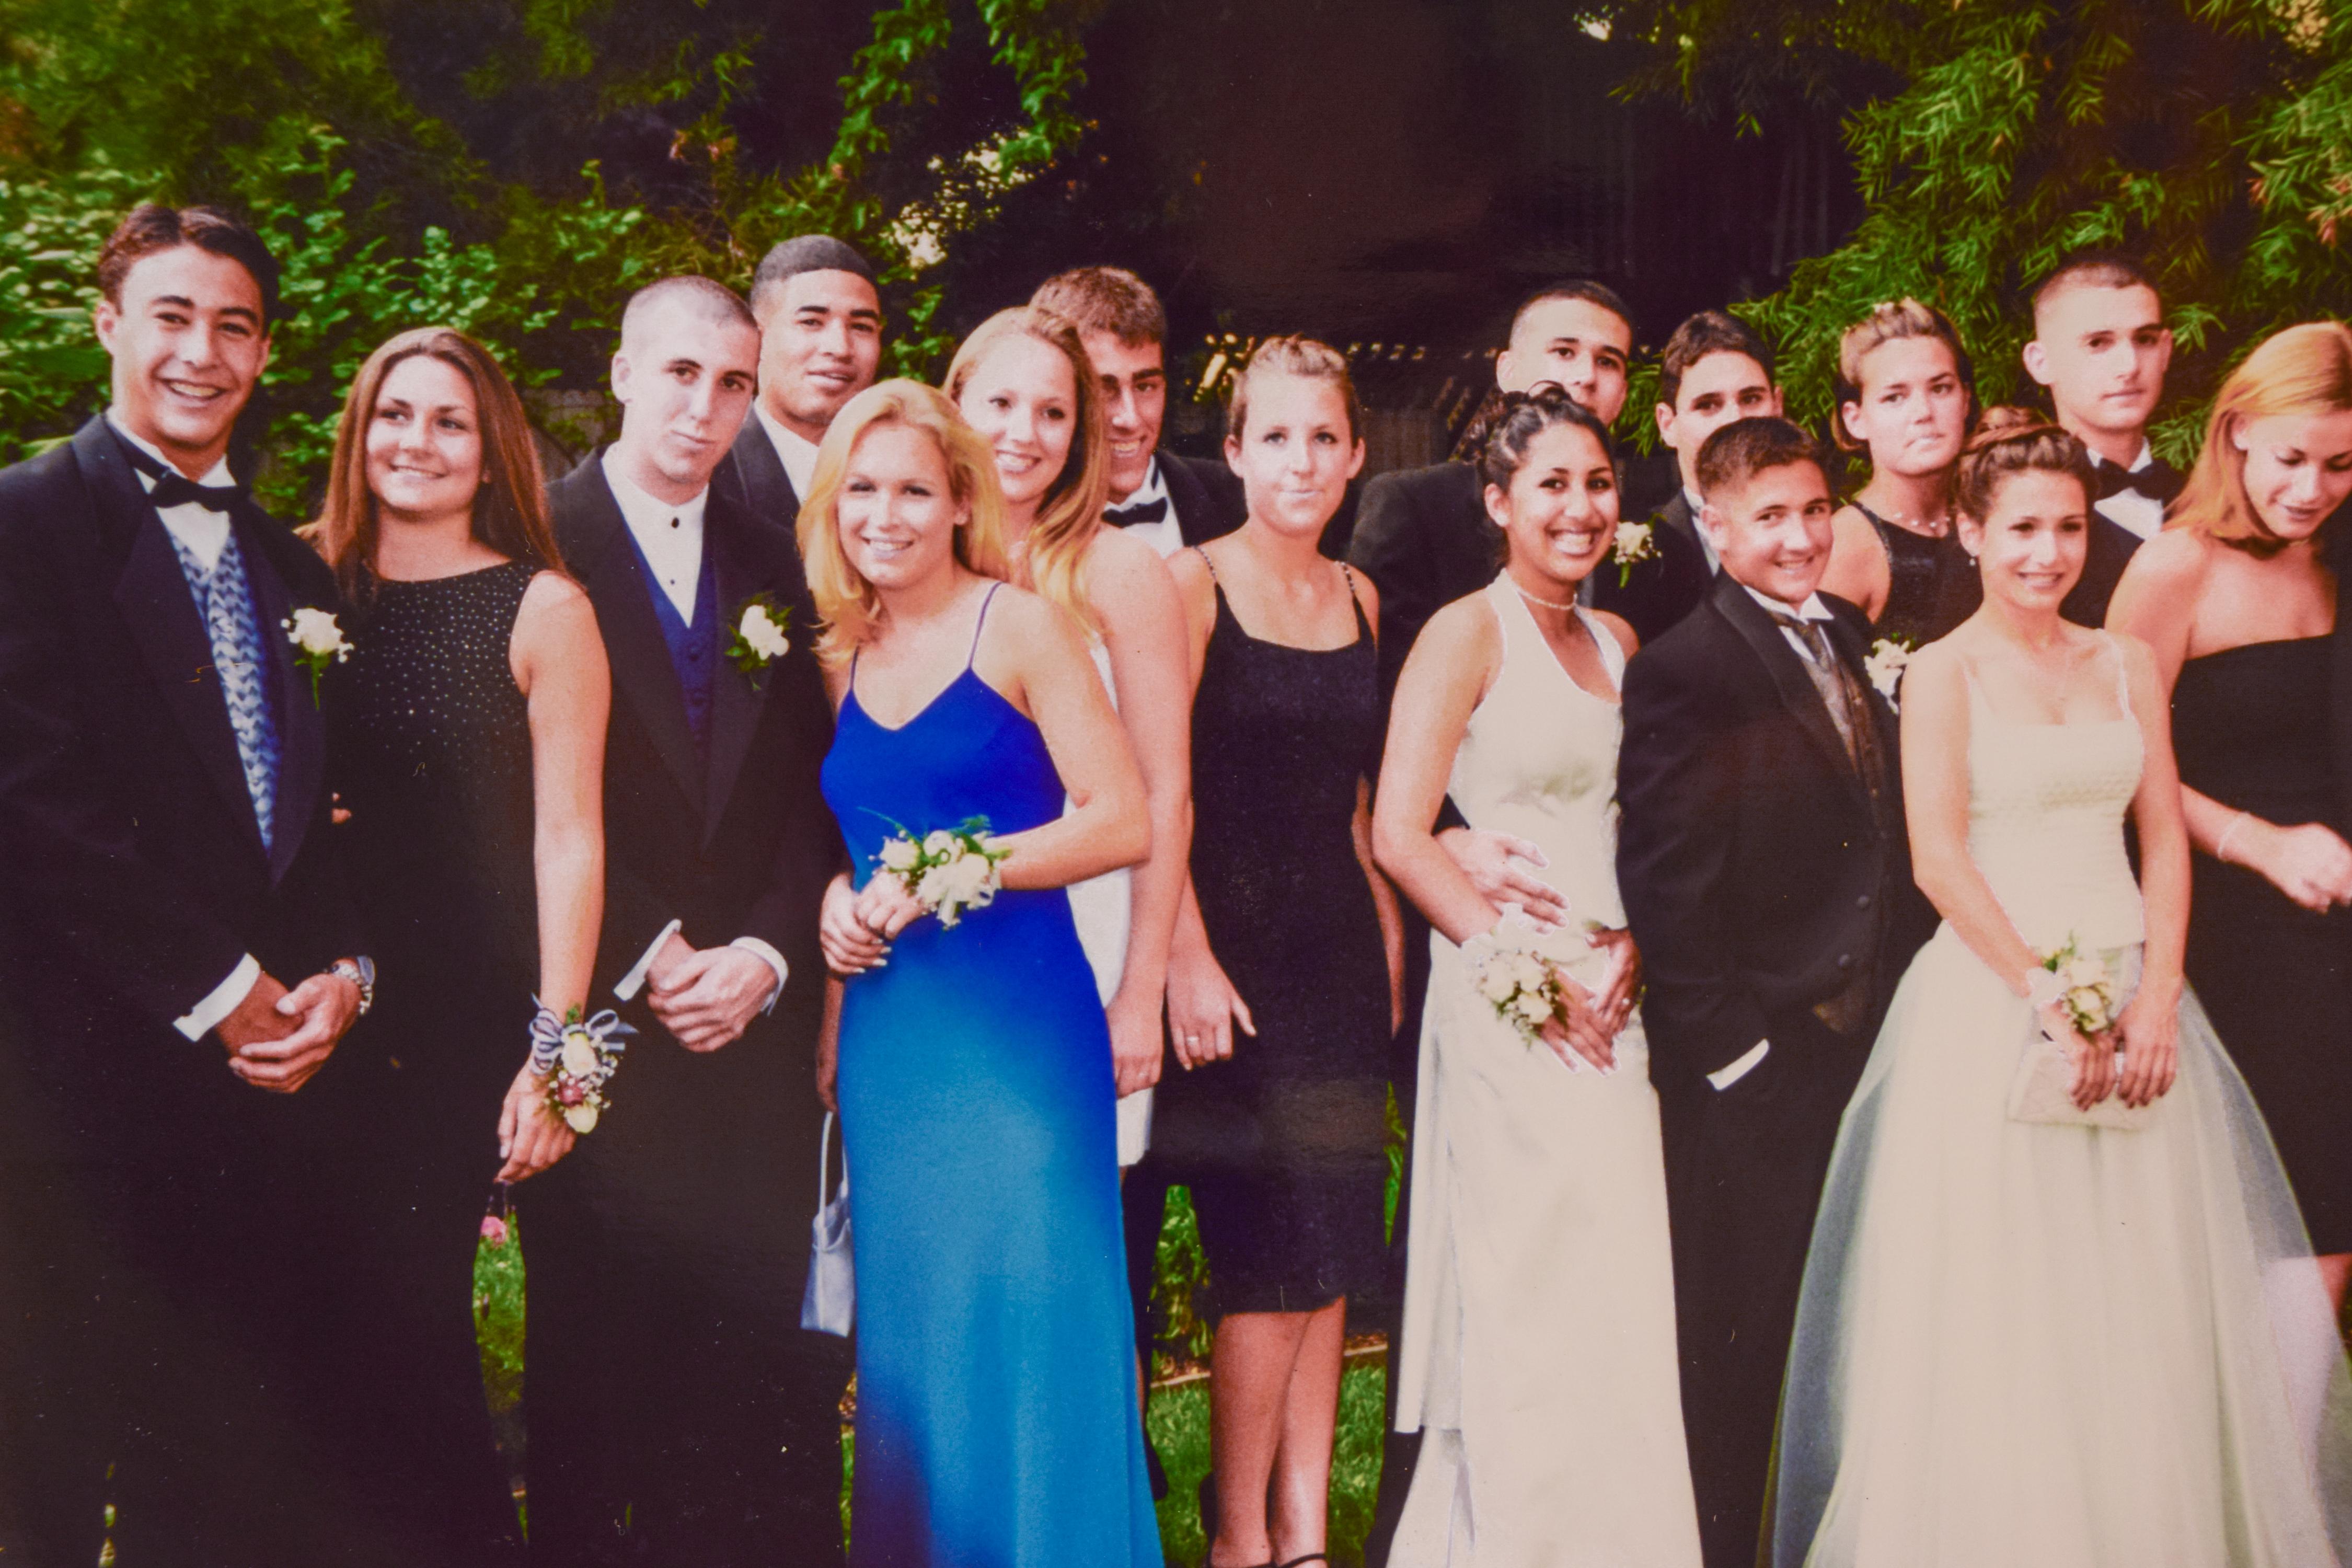 Kellan Hori, far left, and his classmates pose for photos before heading to prom. Photo courtesy Kellan Hori.